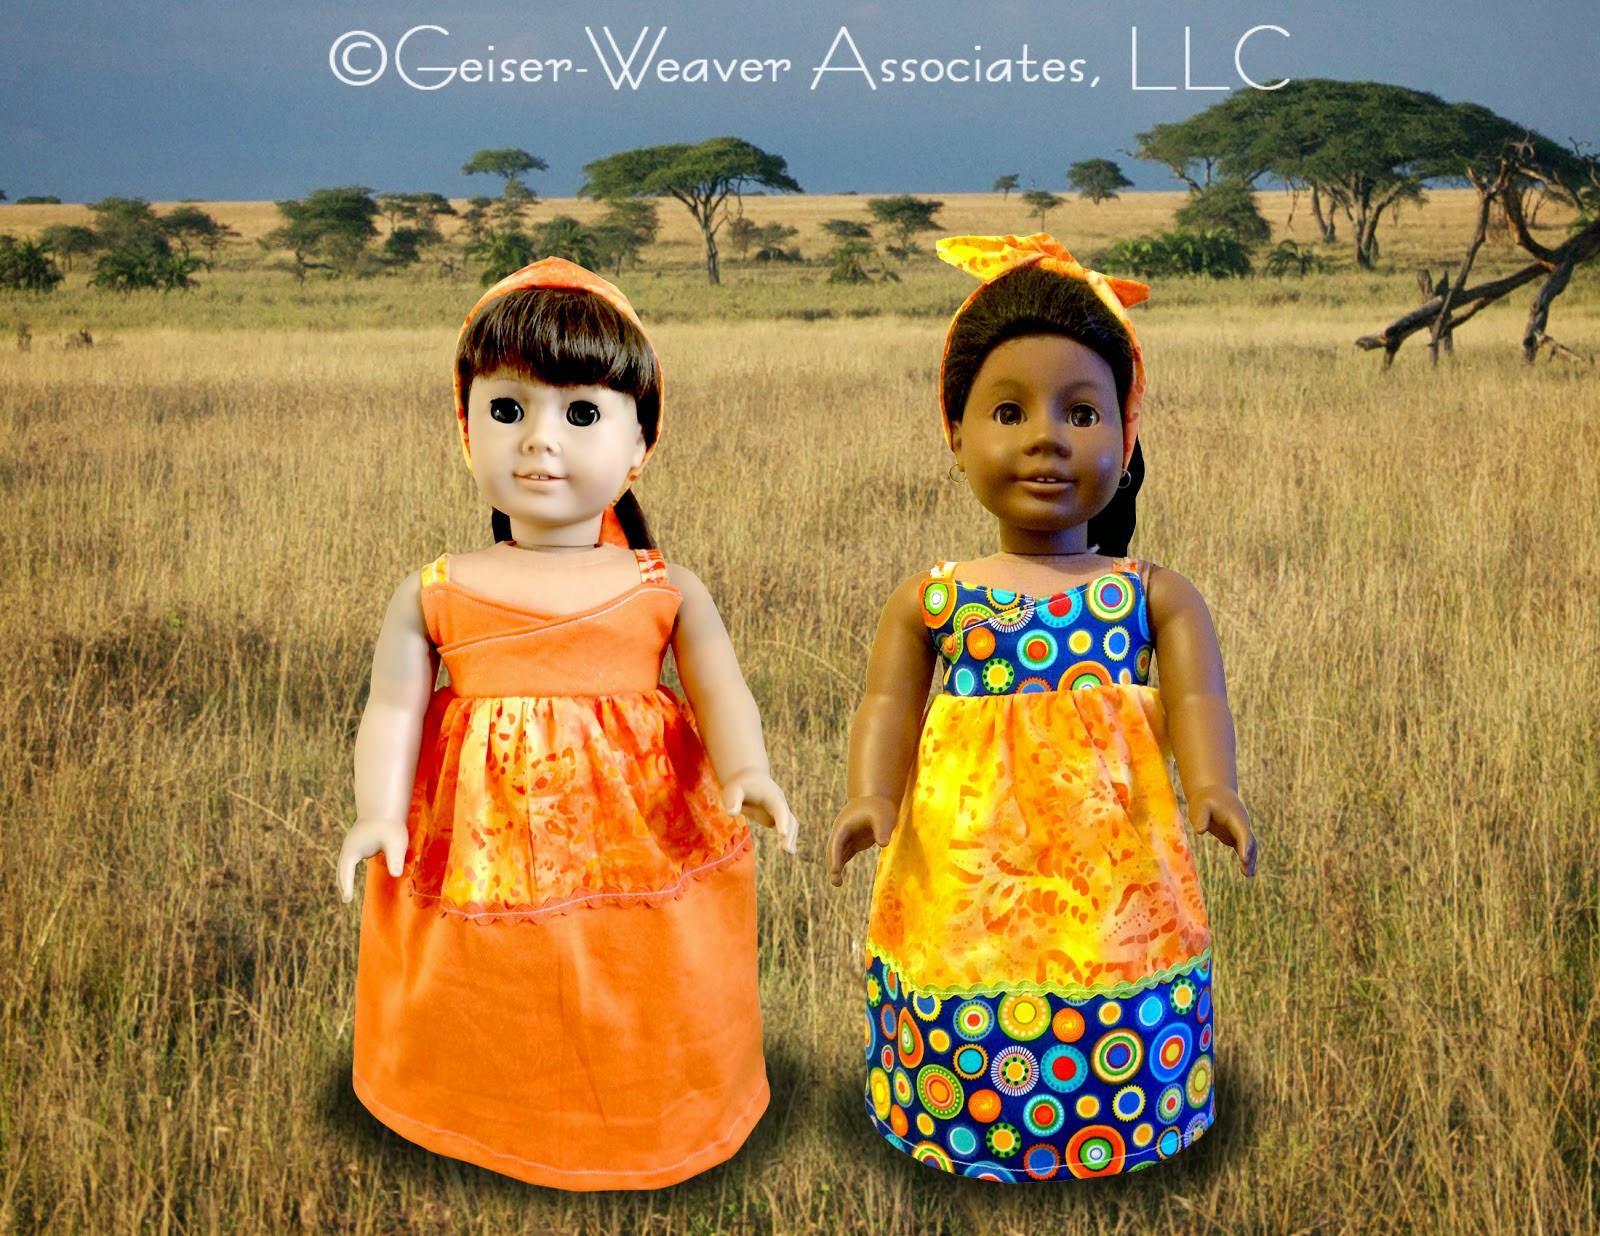 Imagine No Malaria campaign doll clothes by Geiser-Weaver Associates, LLC